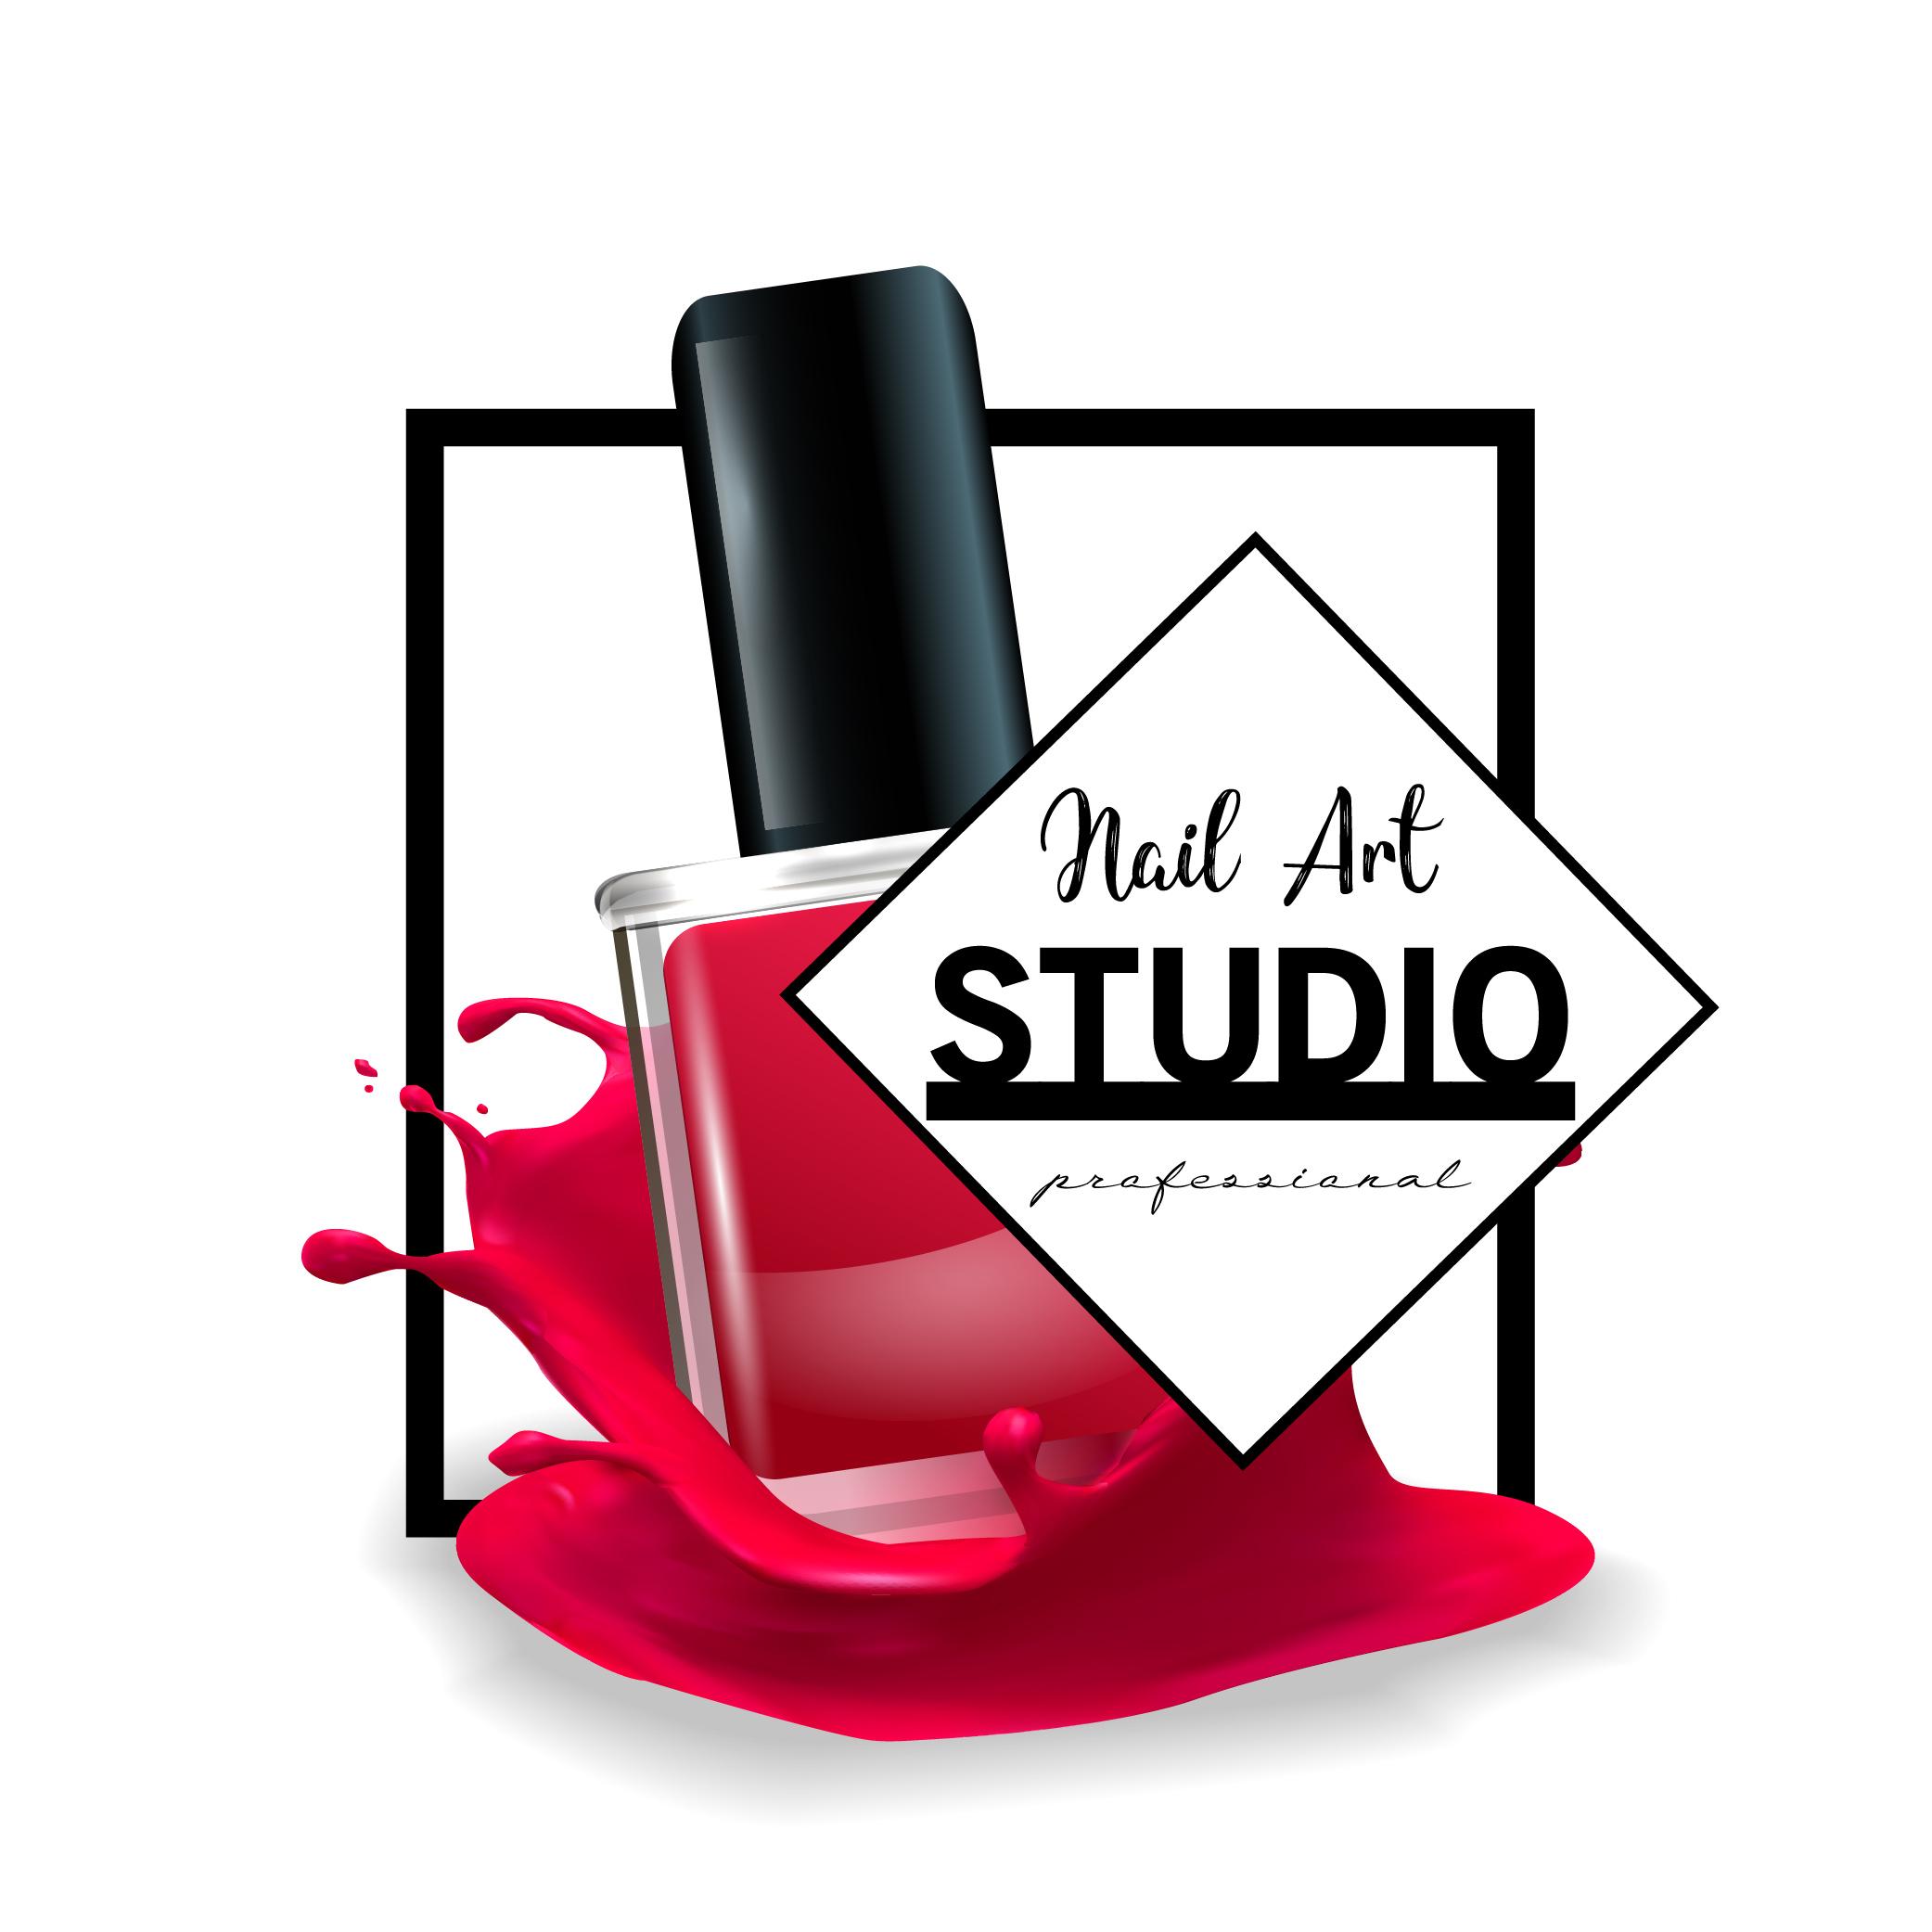 Nail Art studio logo design template. Vector - Download ...